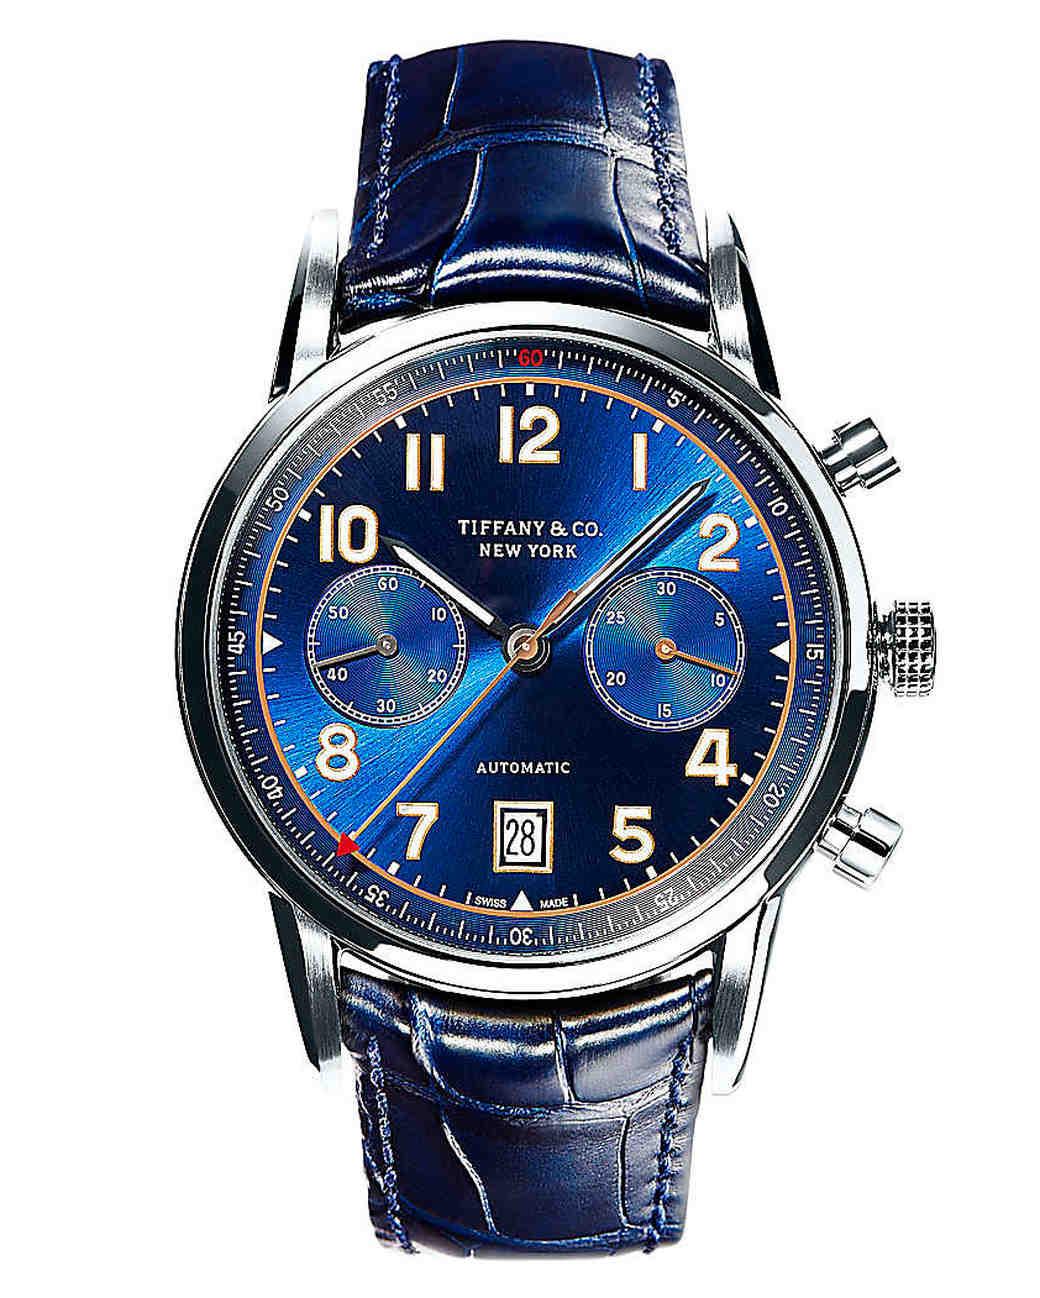 27 menu0027s watches that make an groomu0027s gift martha stewart weddings